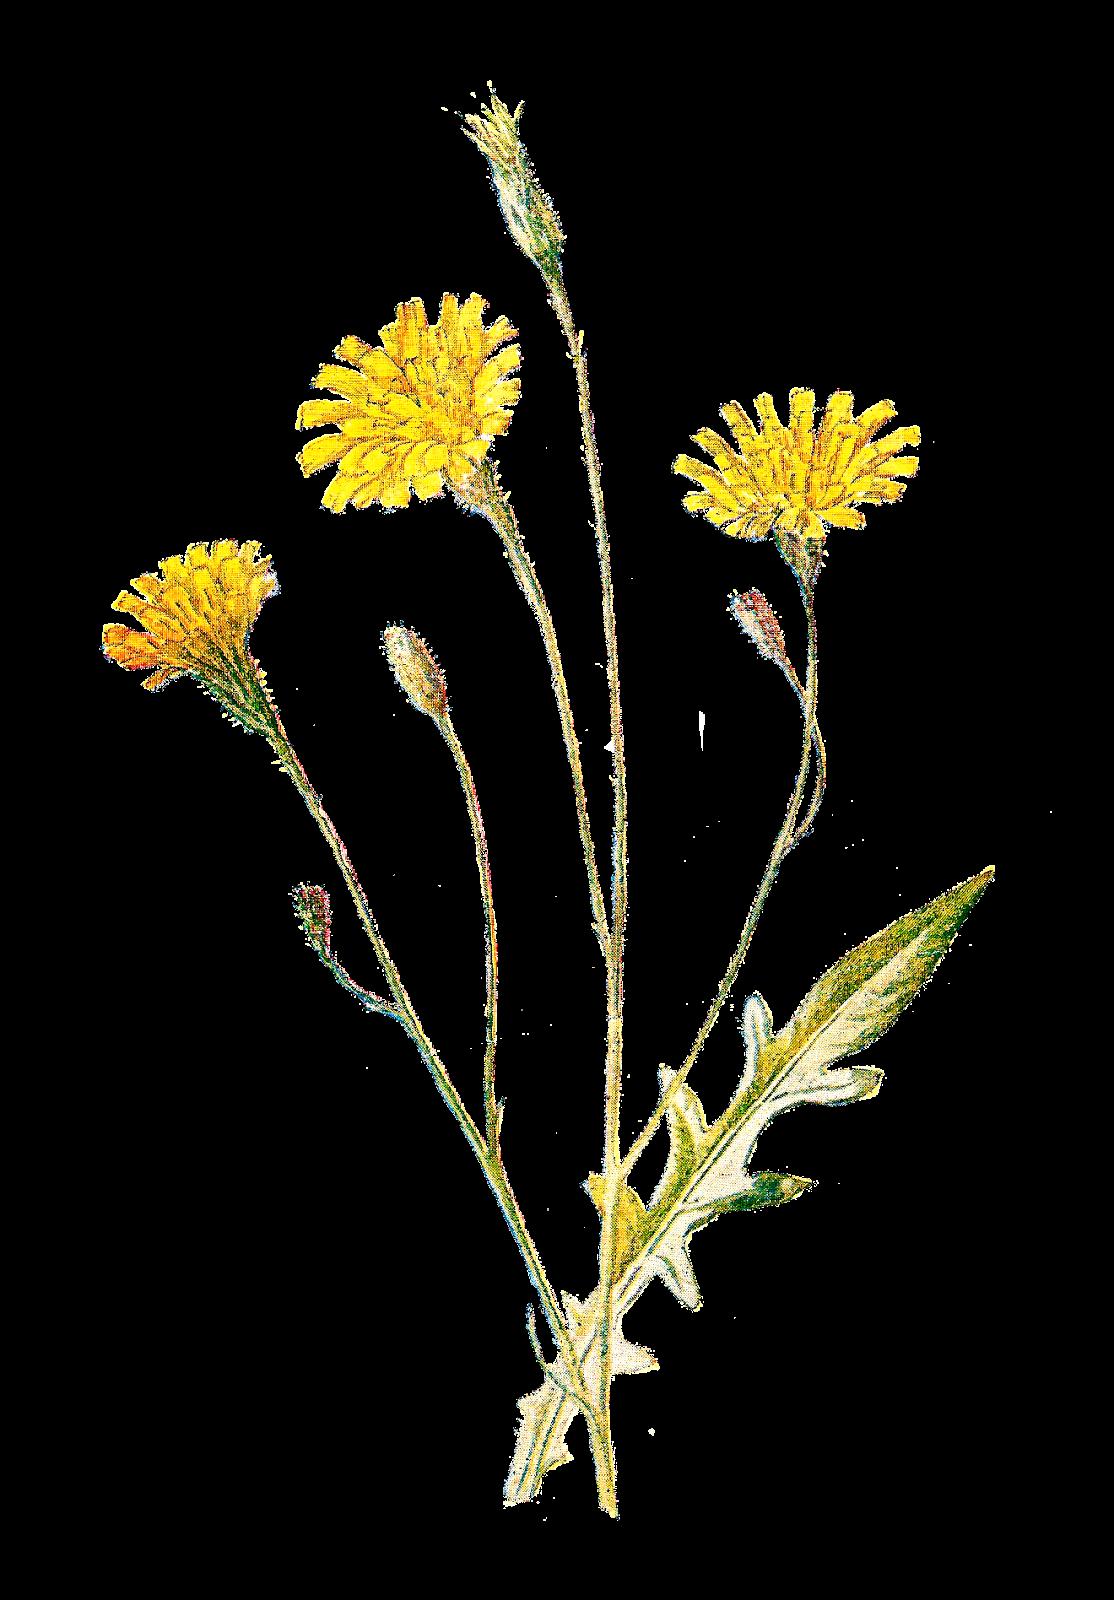 Field clipart field wildflower. Wildflowers of north america